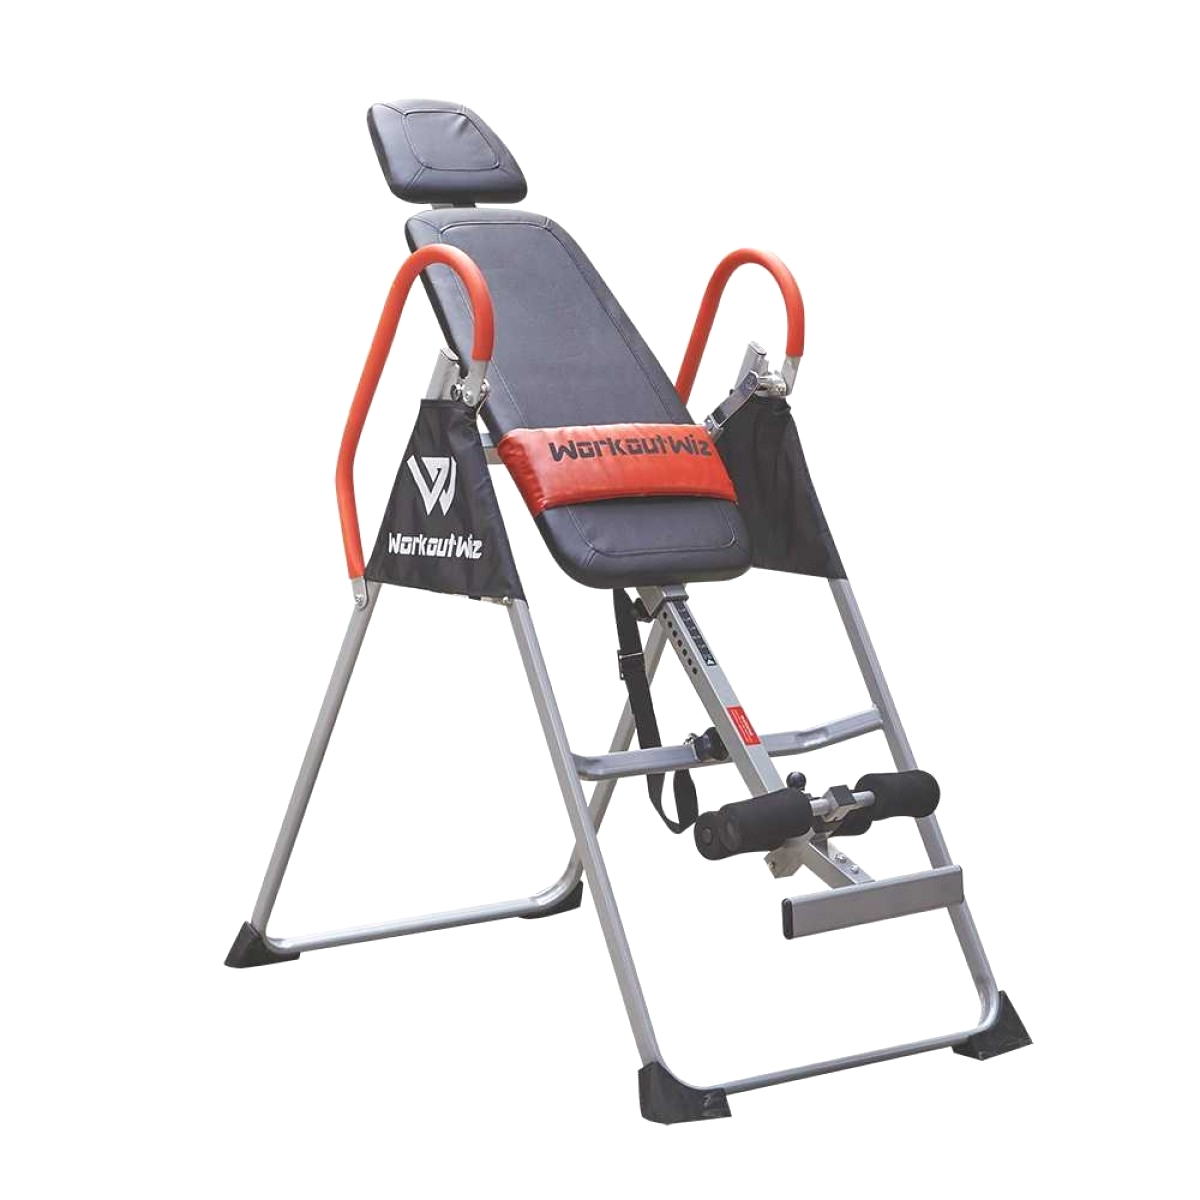 Upside Down Back Chair Best Of Upside Down Back Chair Upside Down Back Pain Home Gym